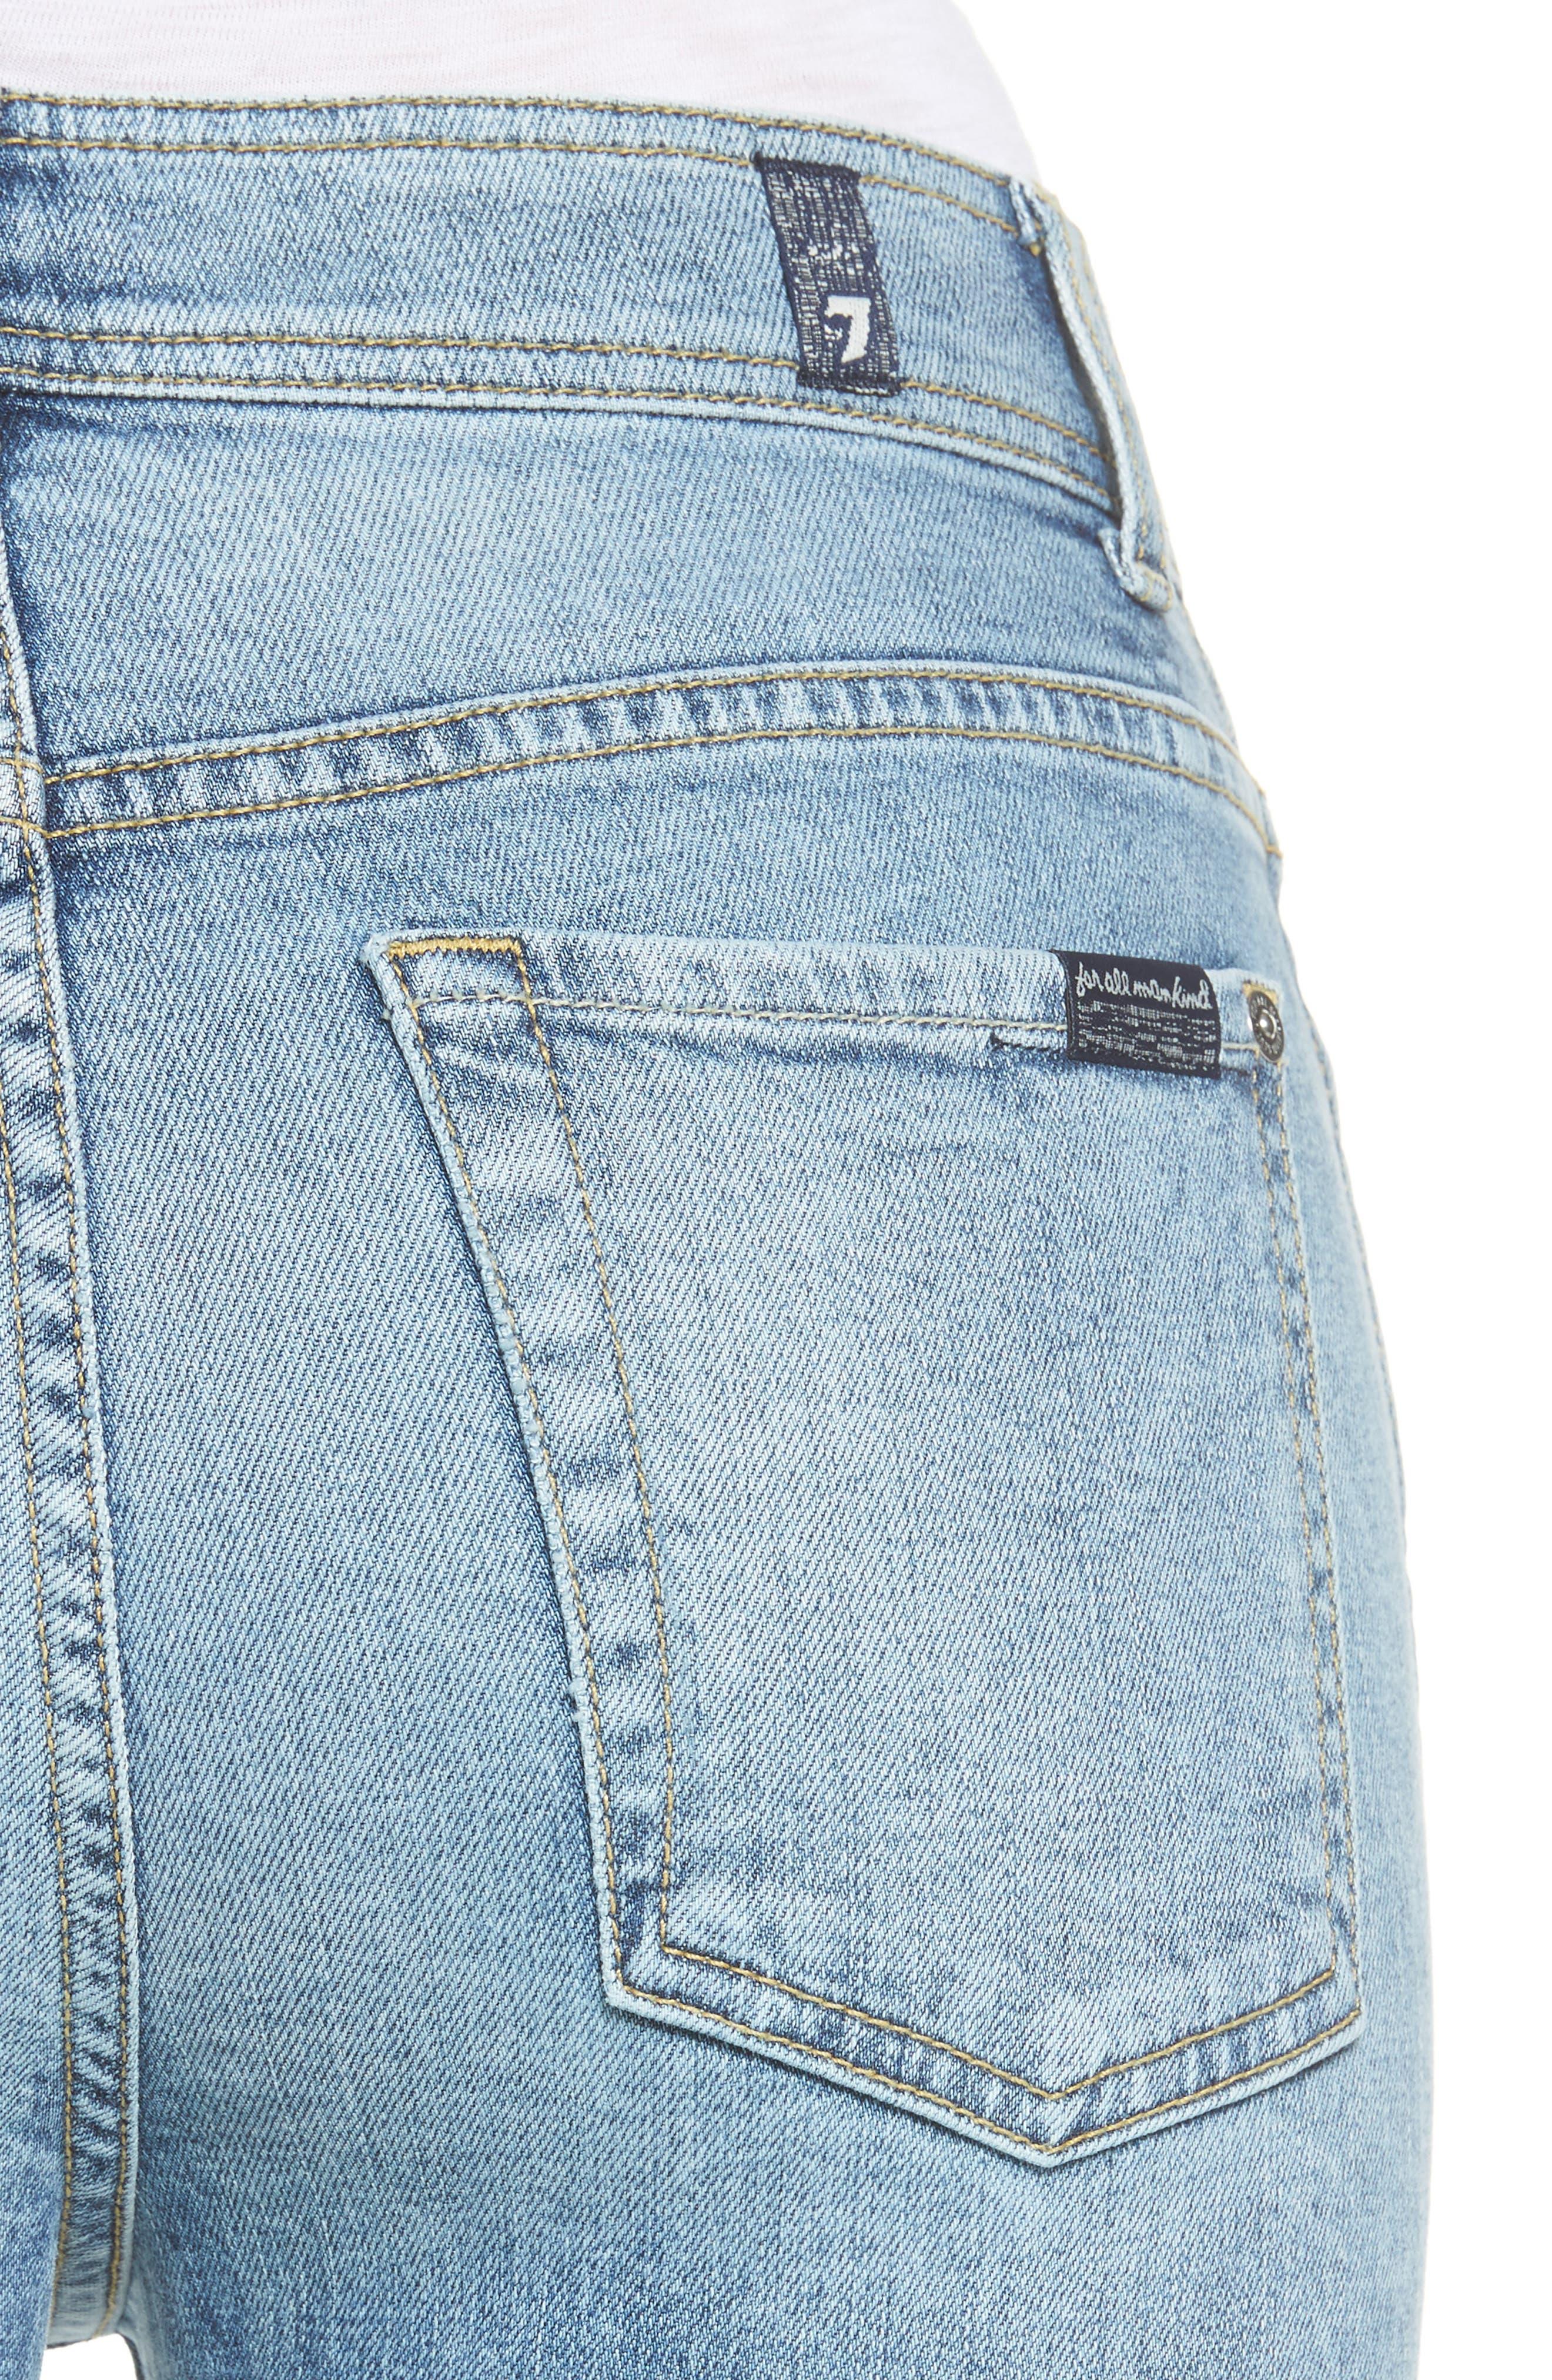 Release Hem Ankle Skinny Jeans,                             Alternate thumbnail 4, color,                             Rockaway Beach- Rckb